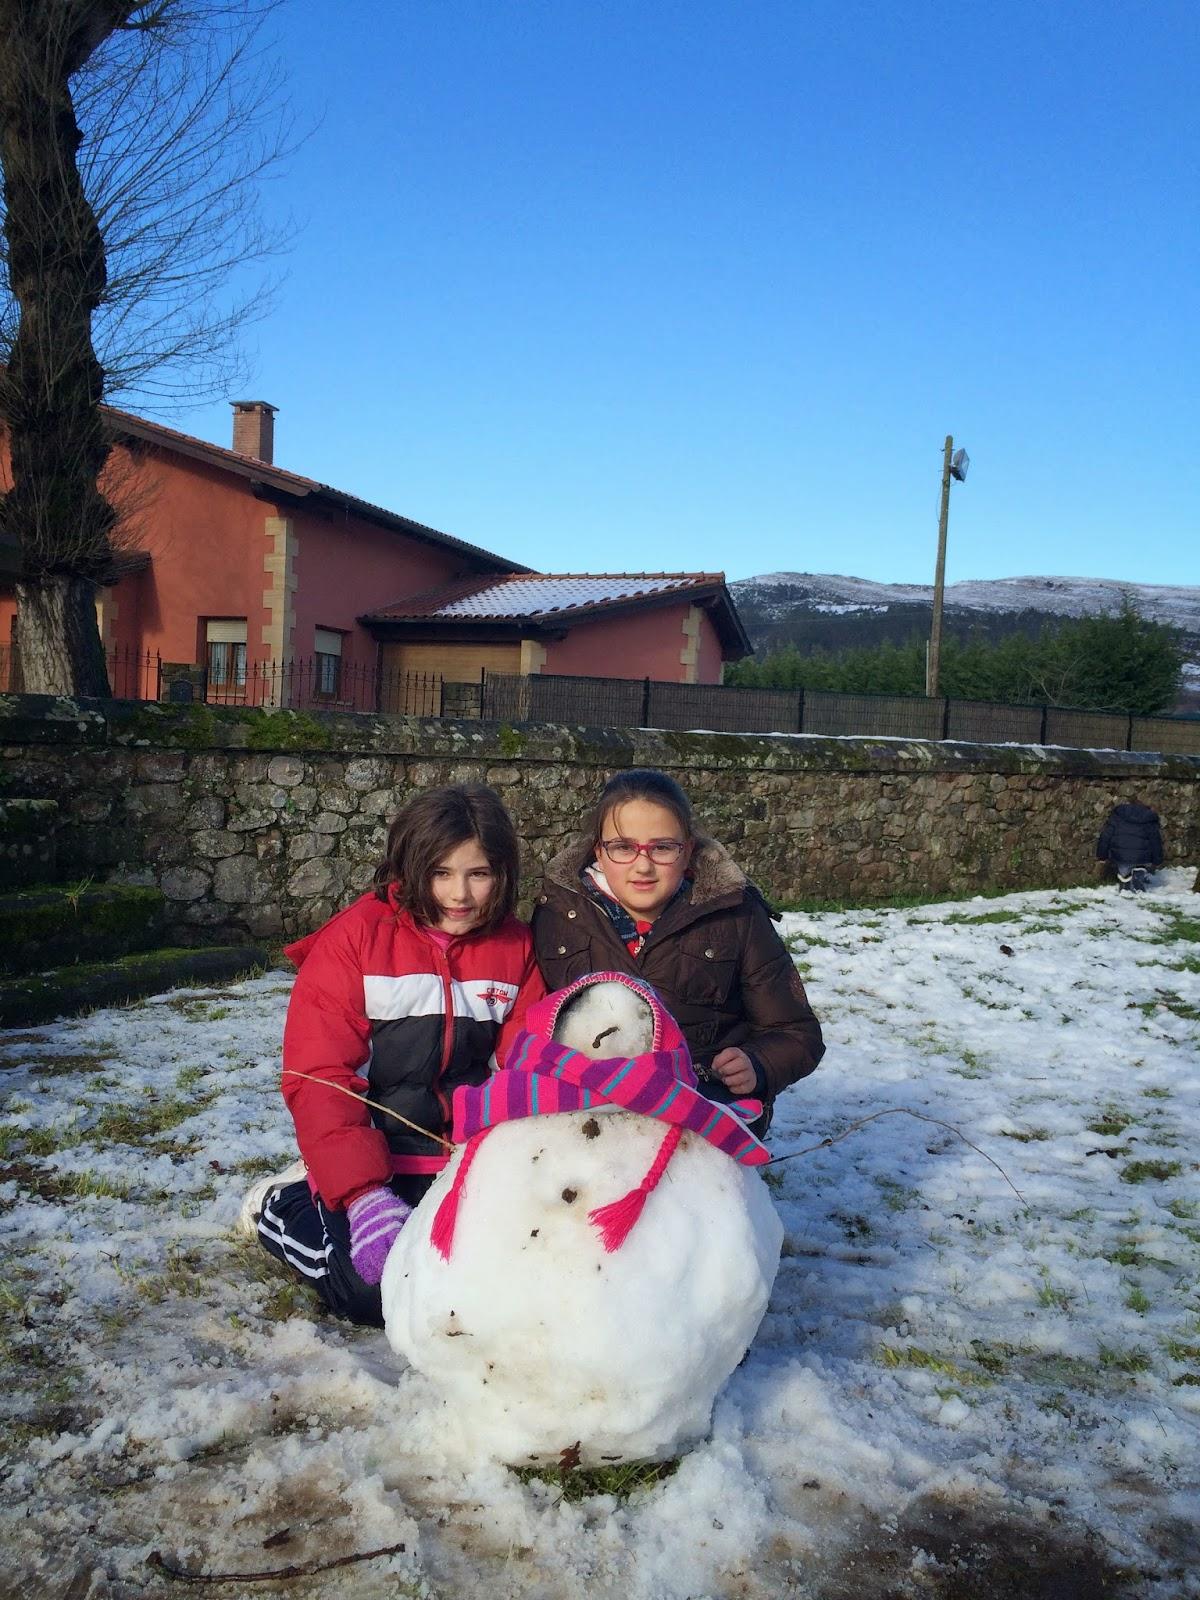 http://www.escuelacasar.net/colecasar20142015/fotos2015/Nieve_escuela/album/index.html#IMG_1394